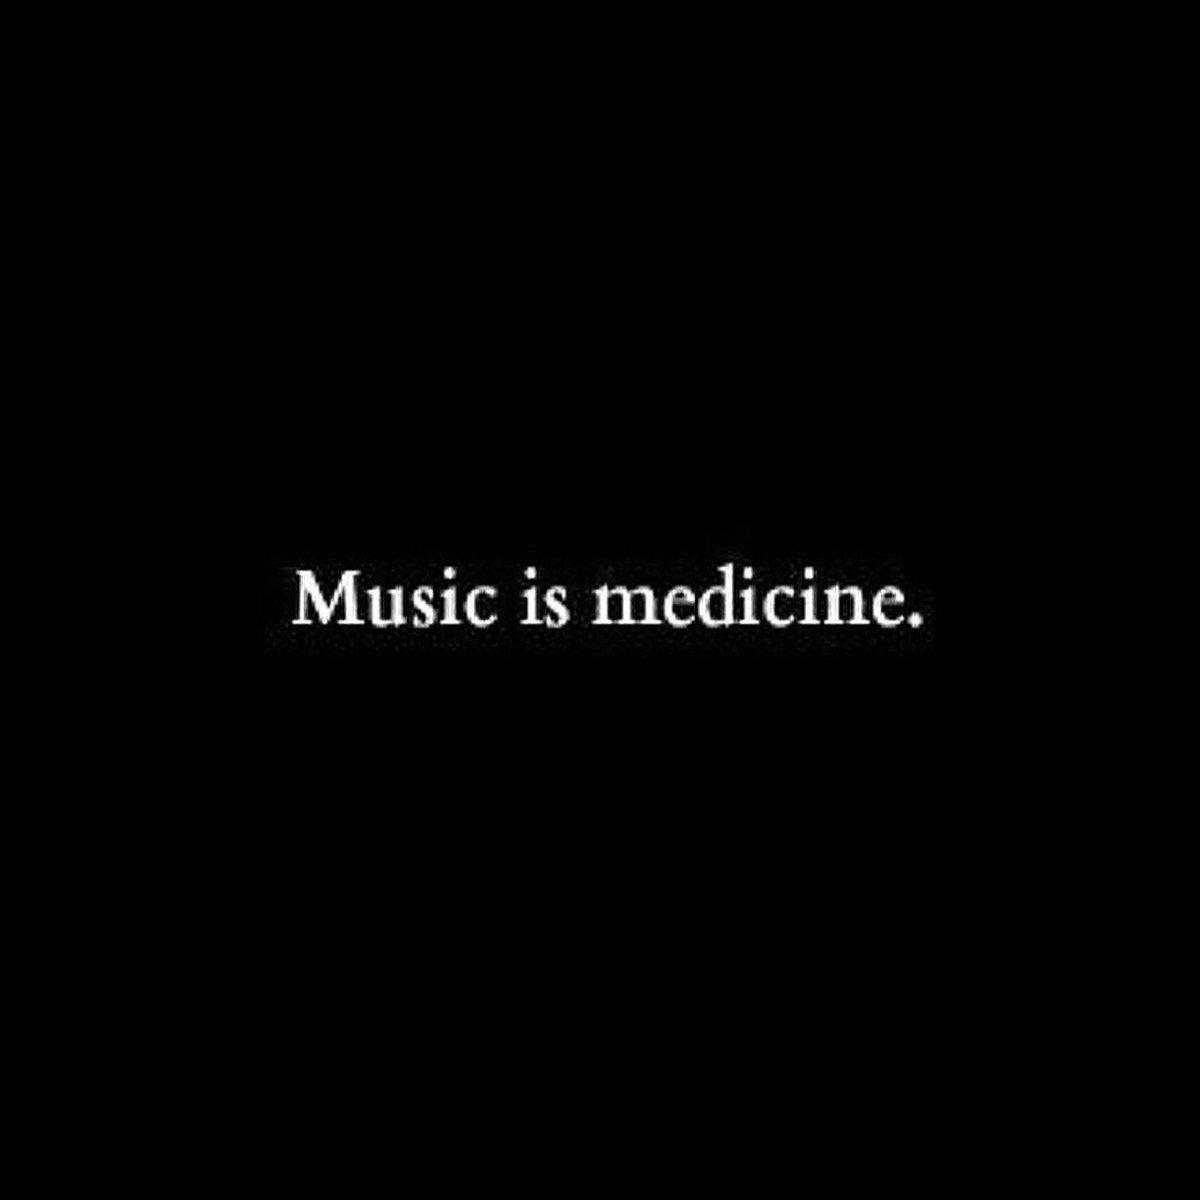 #livemusic